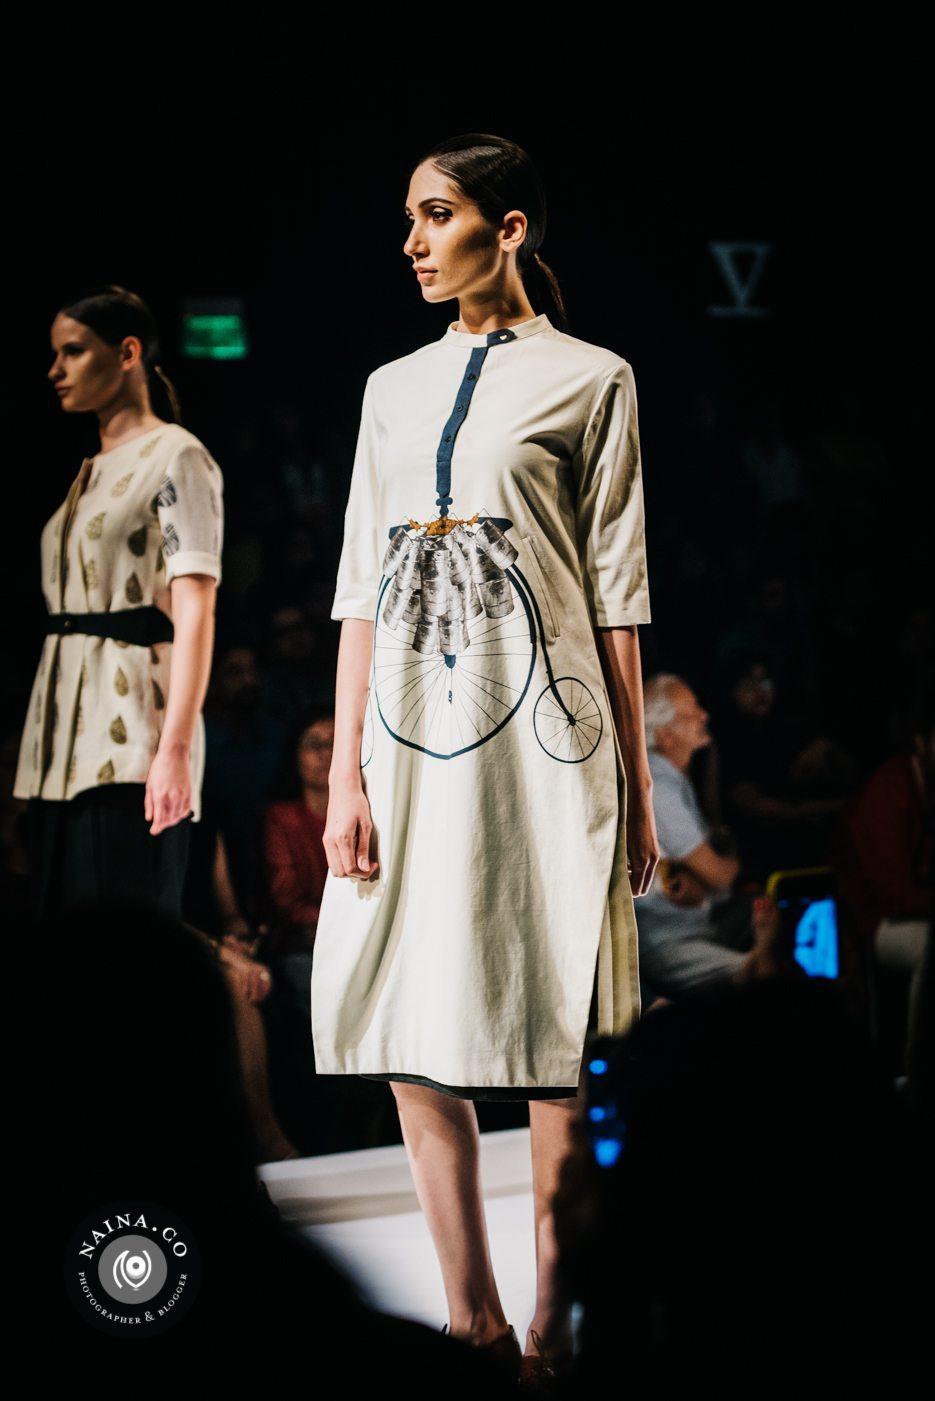 Naina.co-Raconteuse-Visuelle-Photographer-Blogger-Storyteller-Luxury-Lifestyle-AIFWAW15-SnehaArora